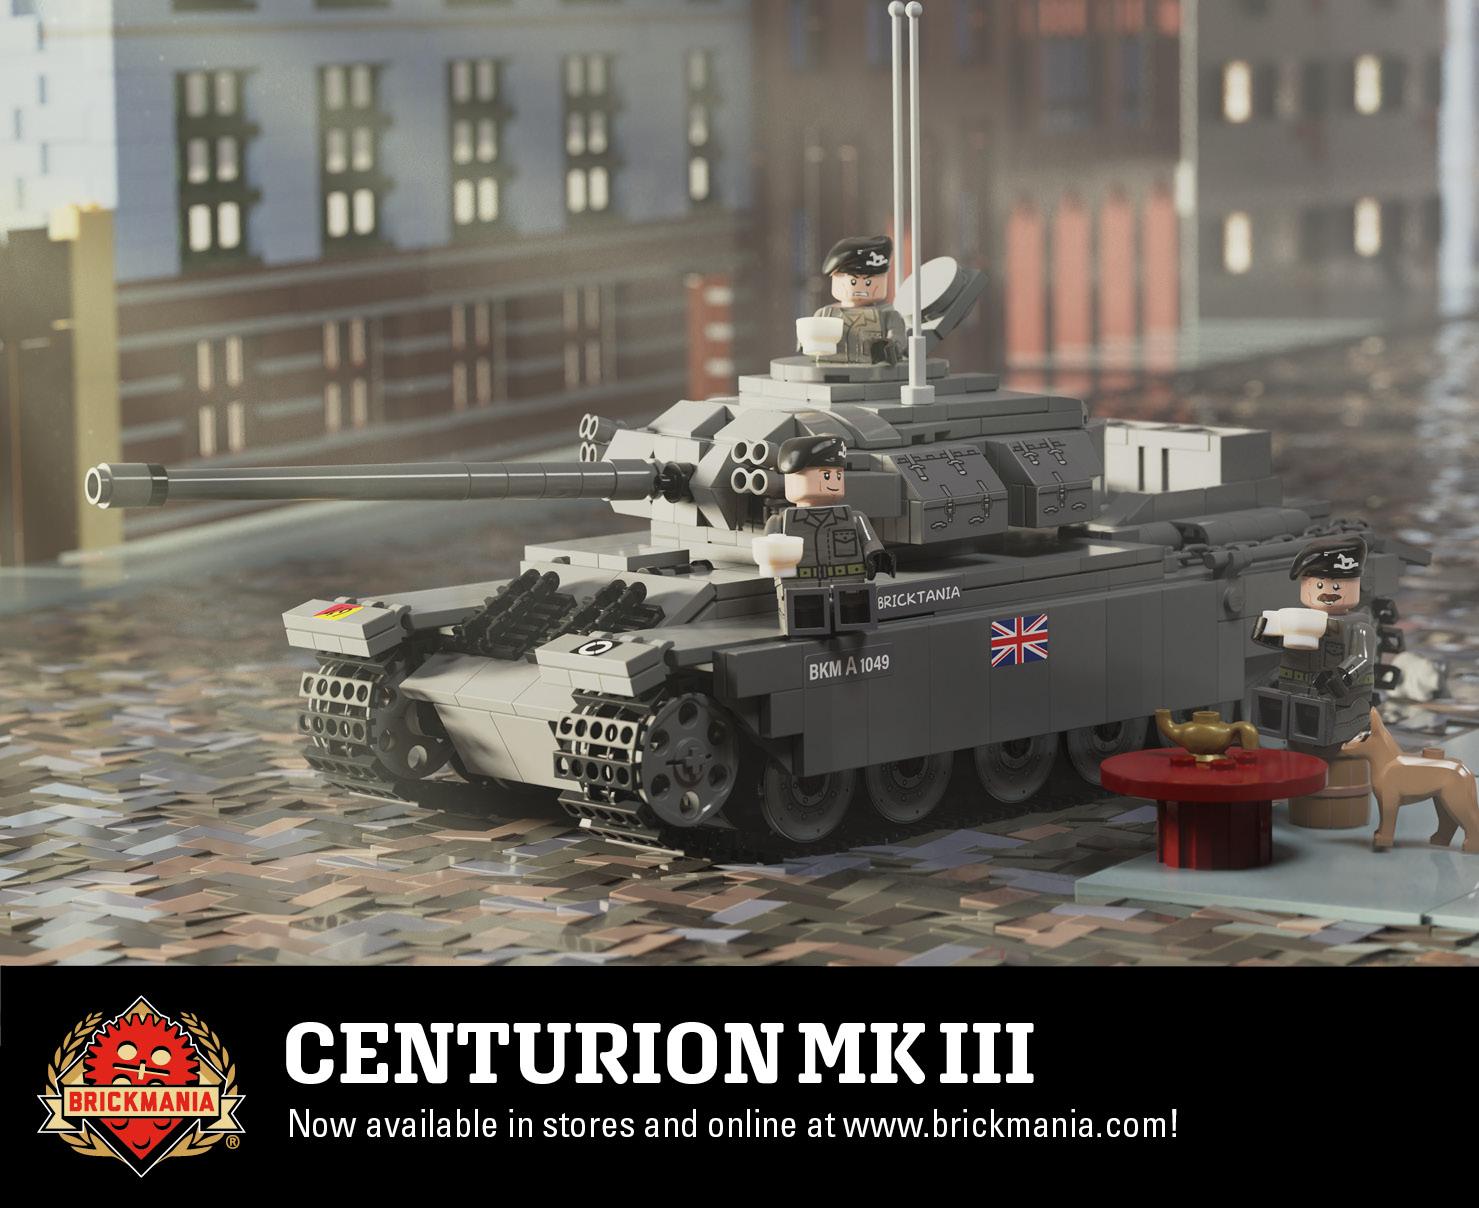 1049-centurion-action-webcard.jpg